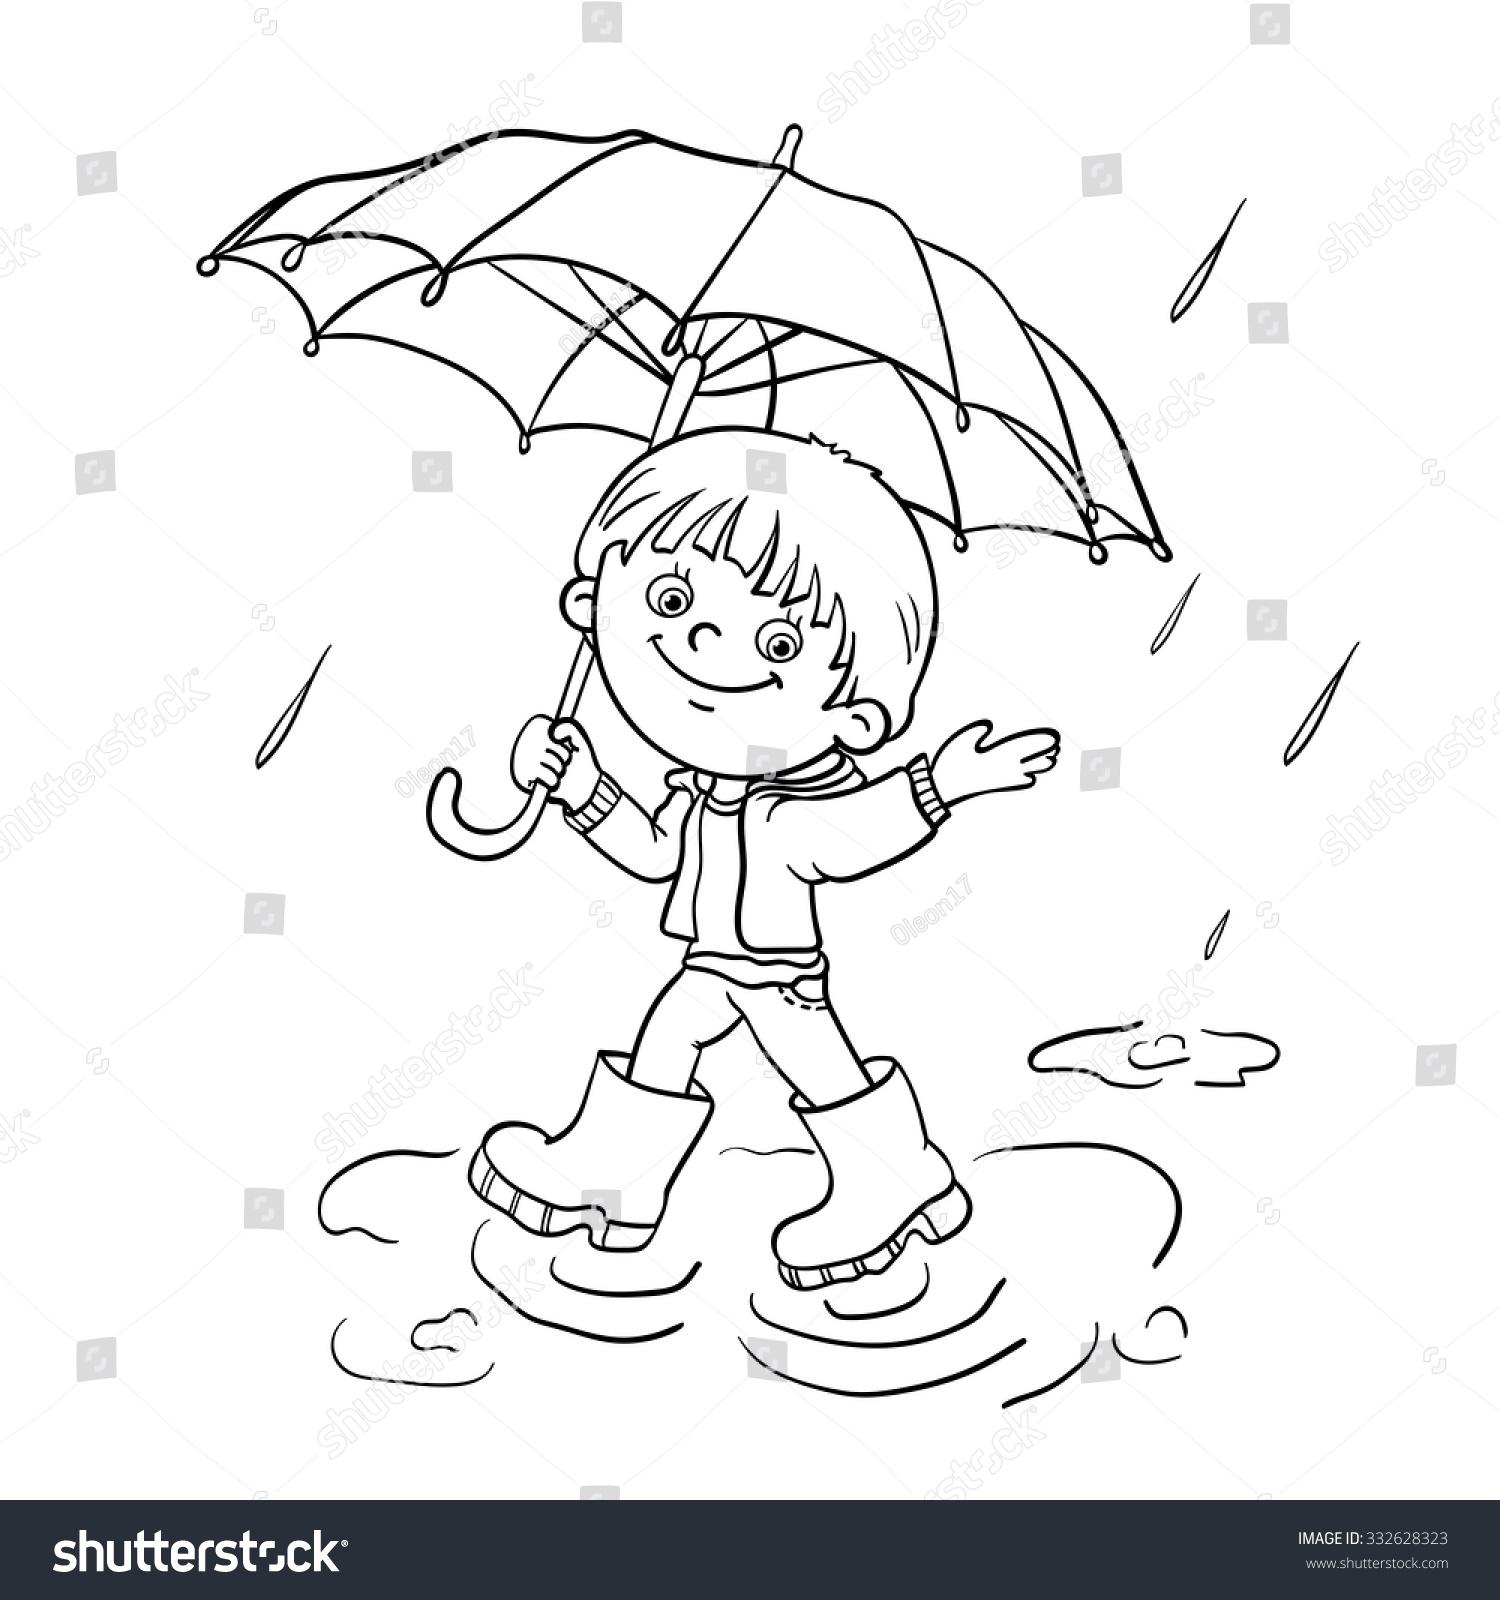 Coloring Page Outline Cartoon Joyful Boy Stock Vector